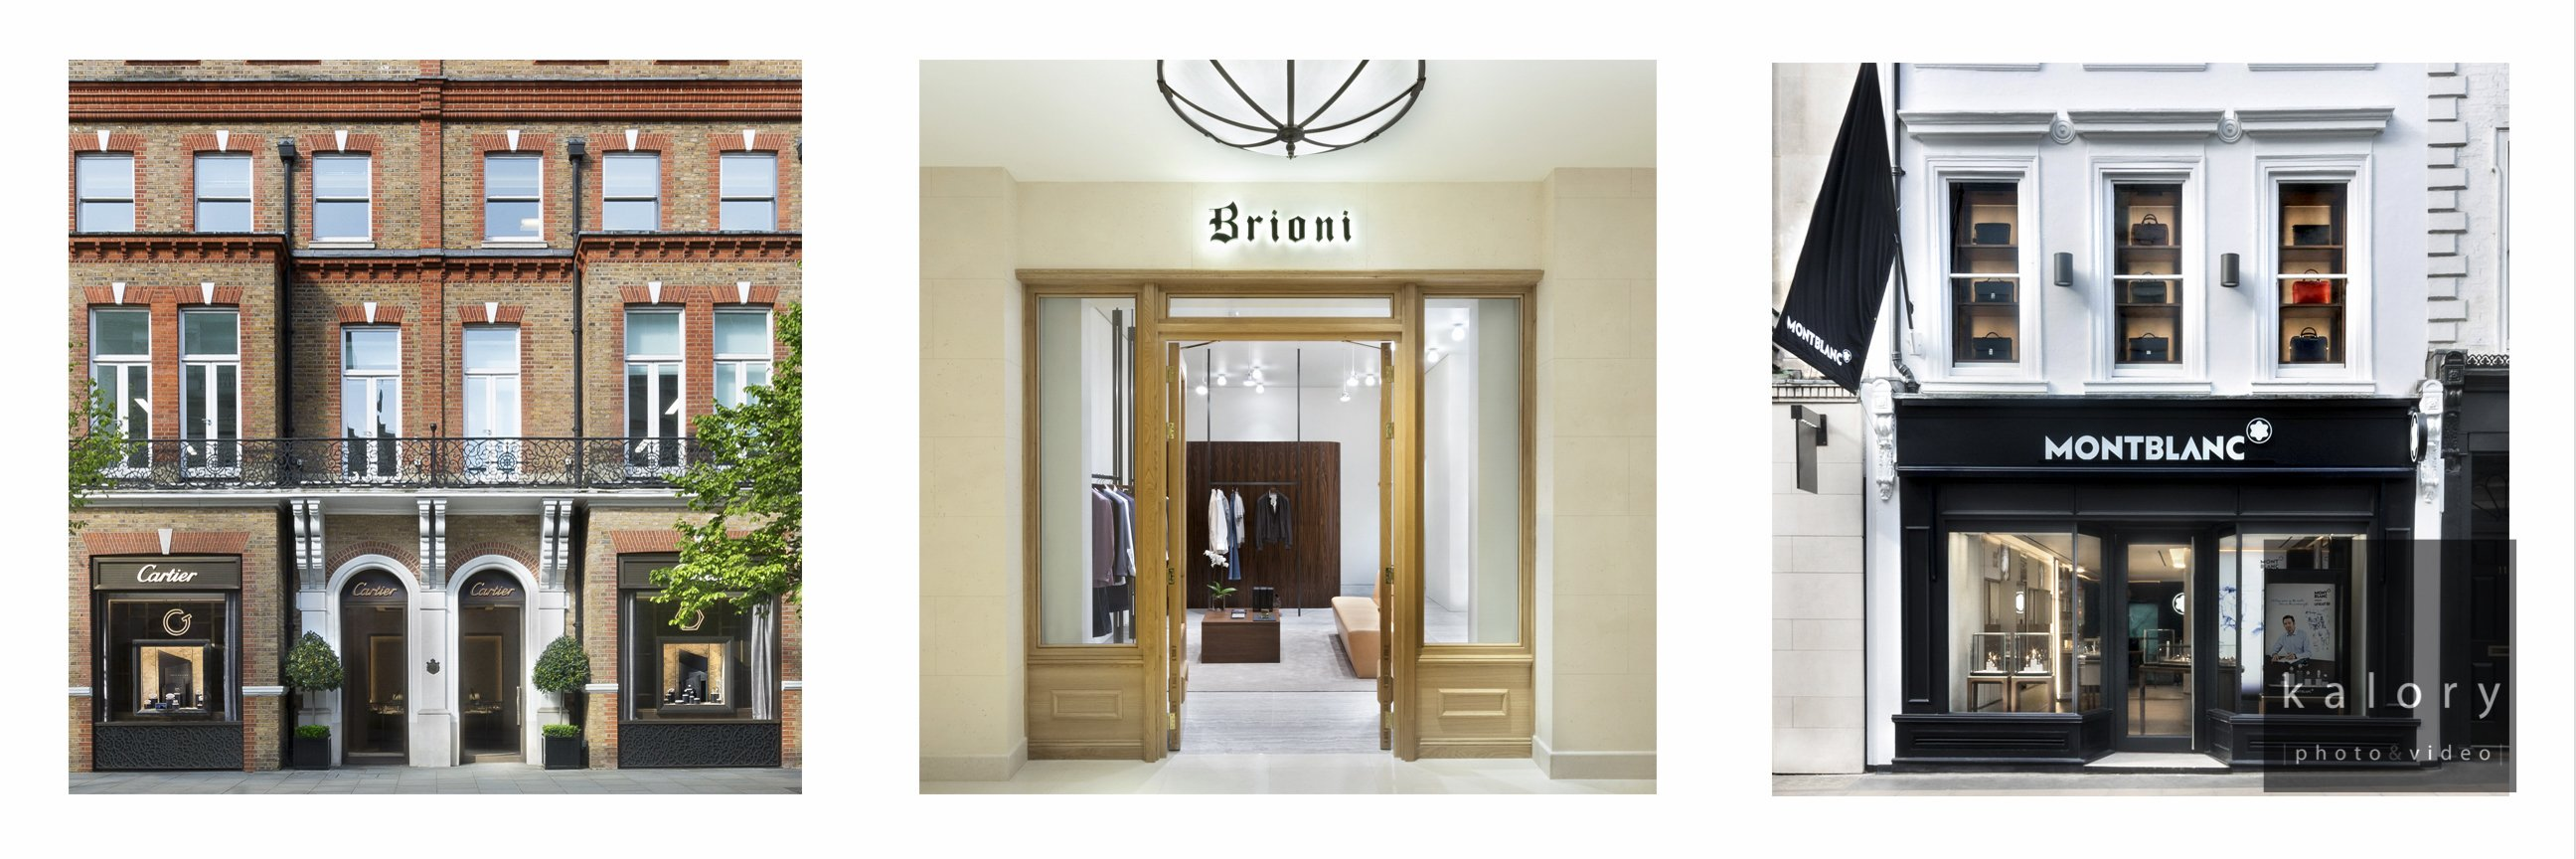 Exterior of Cartier Montblanc and brioni boutique